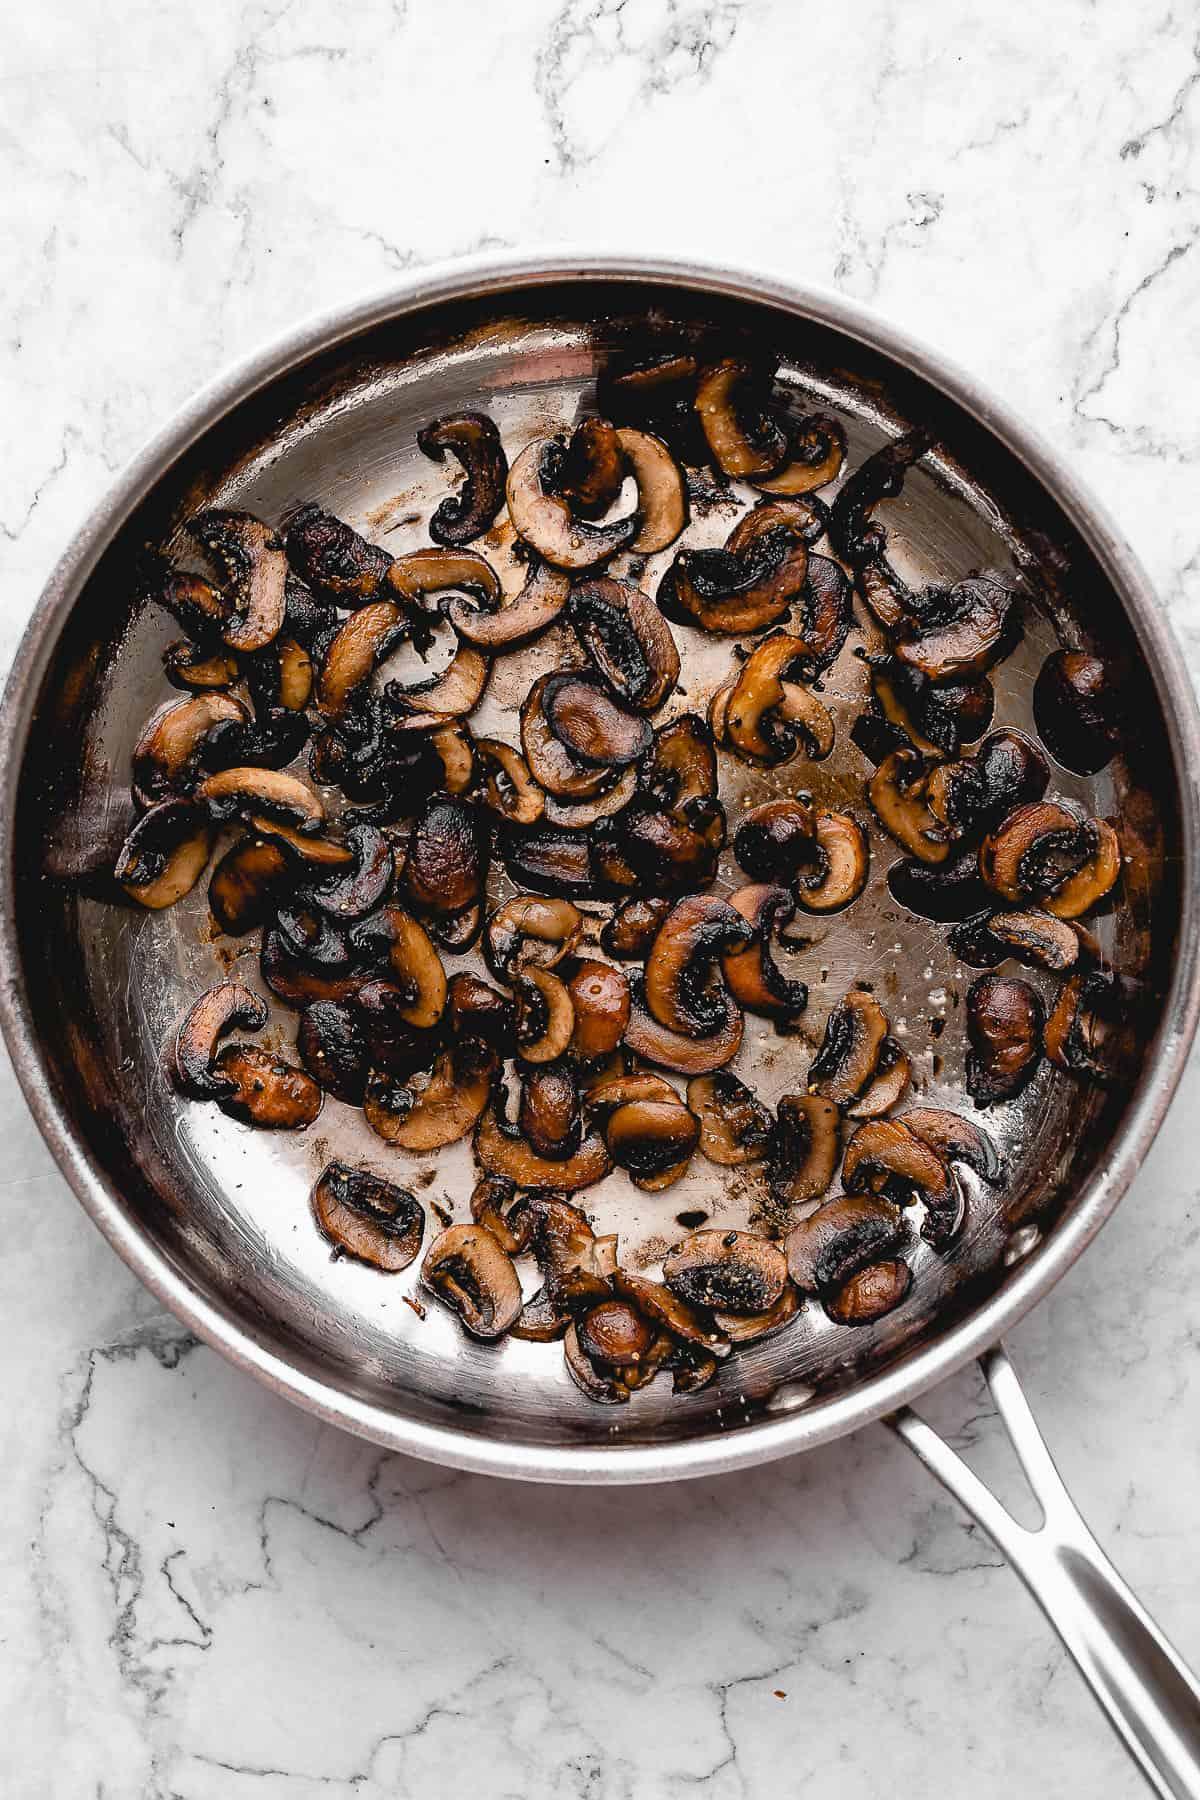 Sautéed mushroom slices in a pan.